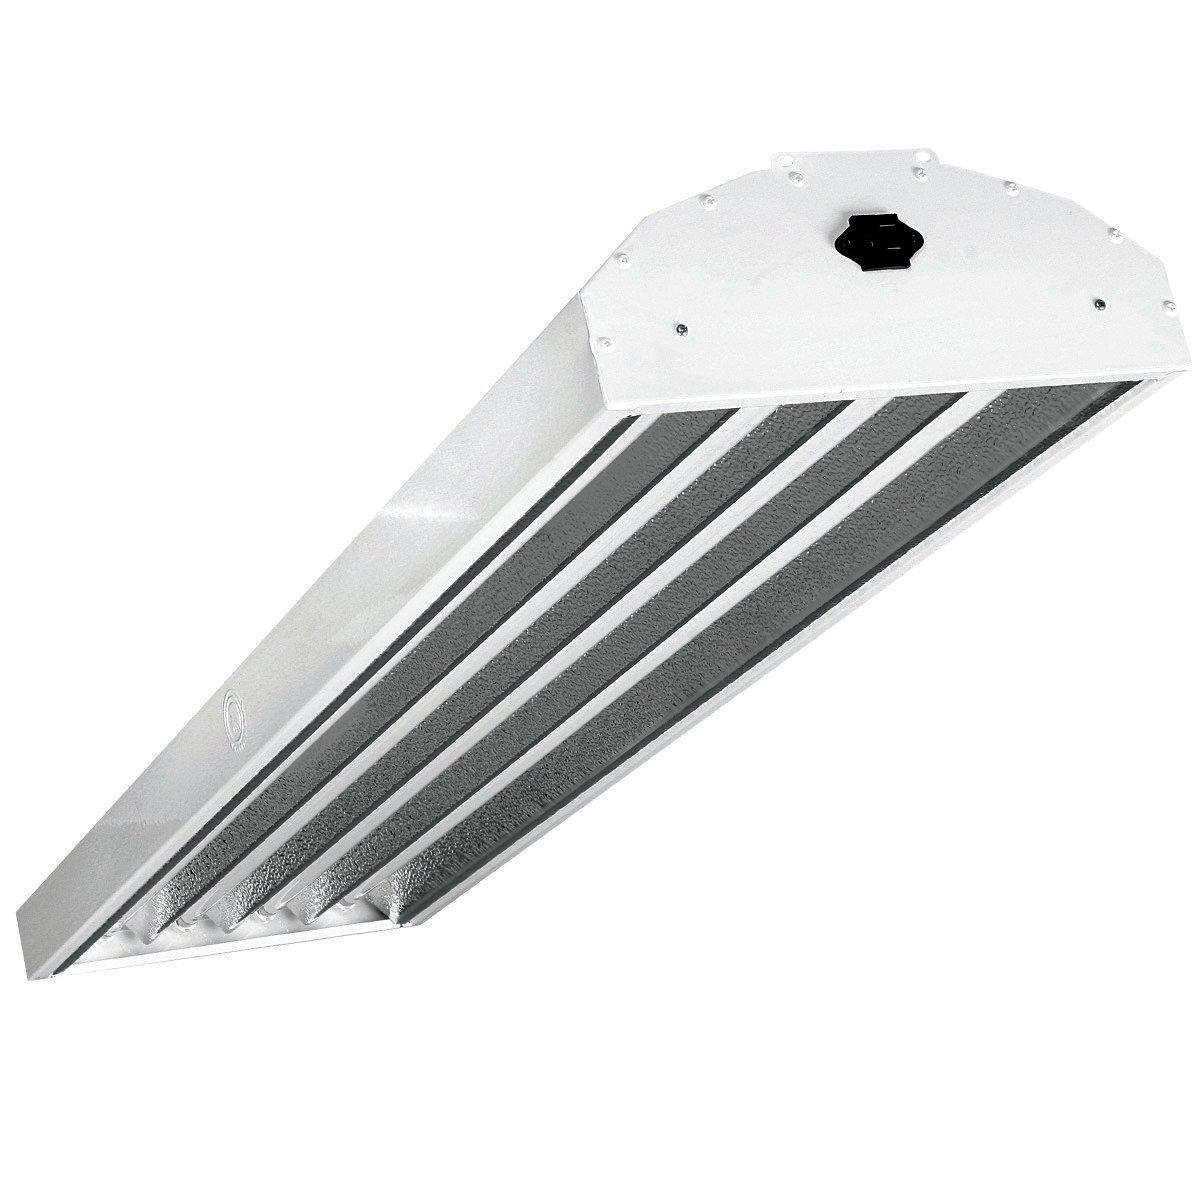 Cheap 8 Lamp T5 Fixture Find Deals On Line At Ft 2lamp 120volt Residential Electronic Ballast For 21 28watt Get Quotations Maverick Sun Fmother4f4l Mother Ho Fluorescent 4 Feet